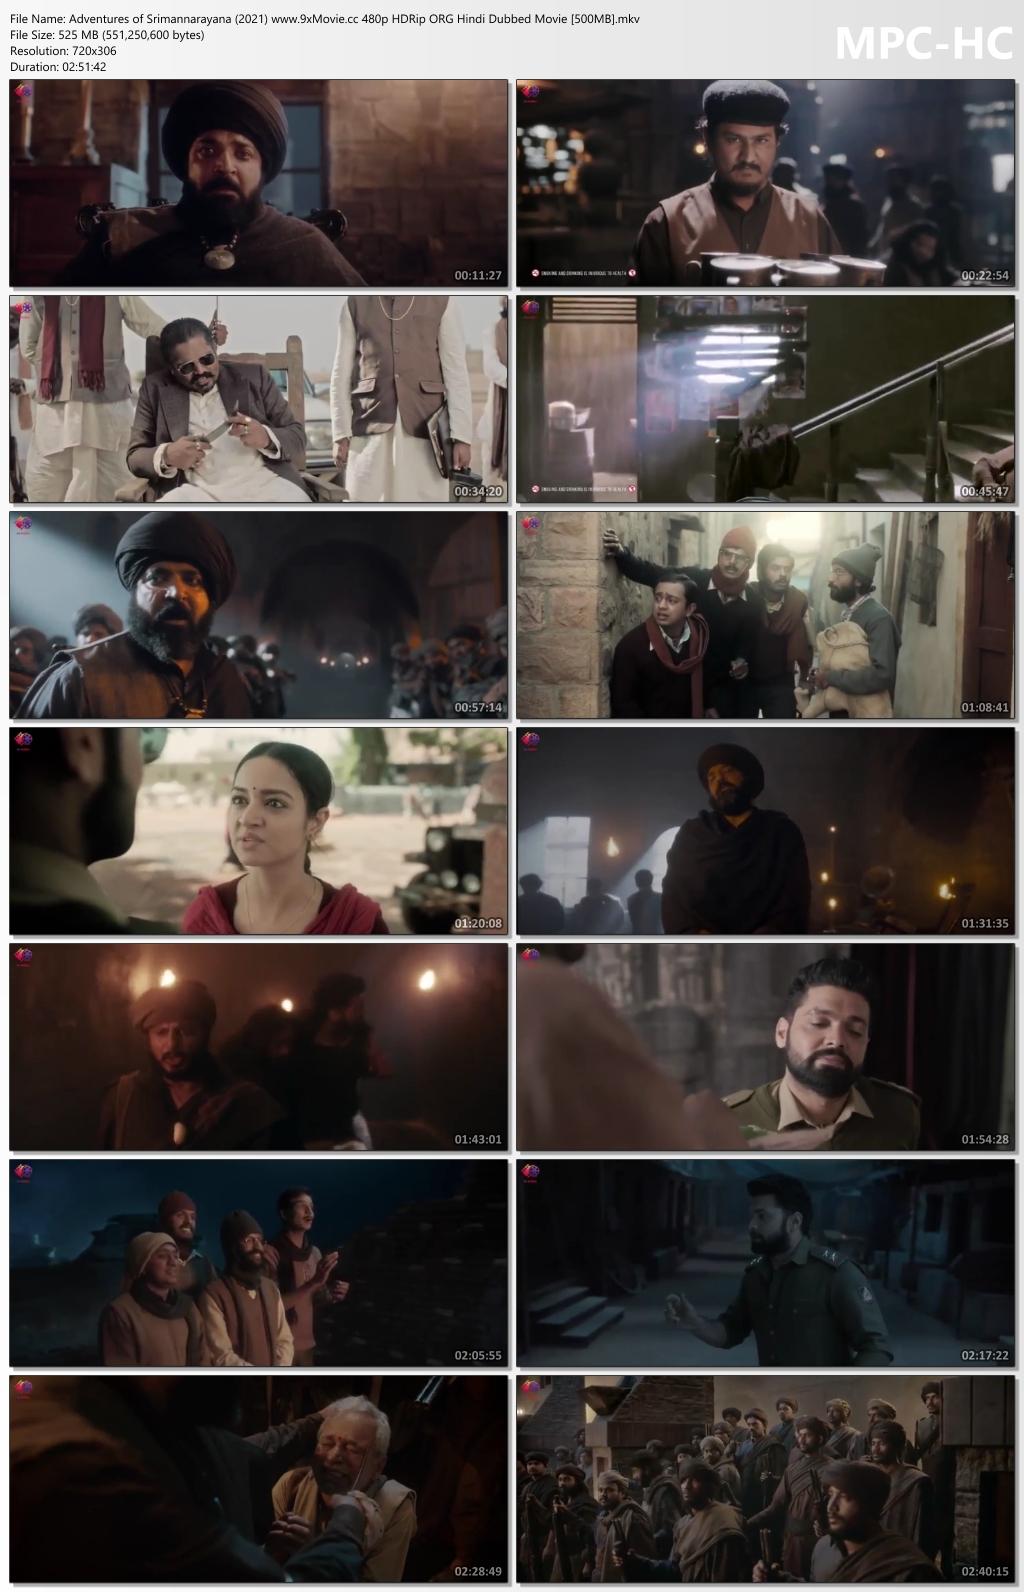 Adventures-of-Srimannarayana-2021-www-9x-Movie-cc-480p-HDRip-ORG-Hindi-Dubbed-Movie-500-MB-mkv